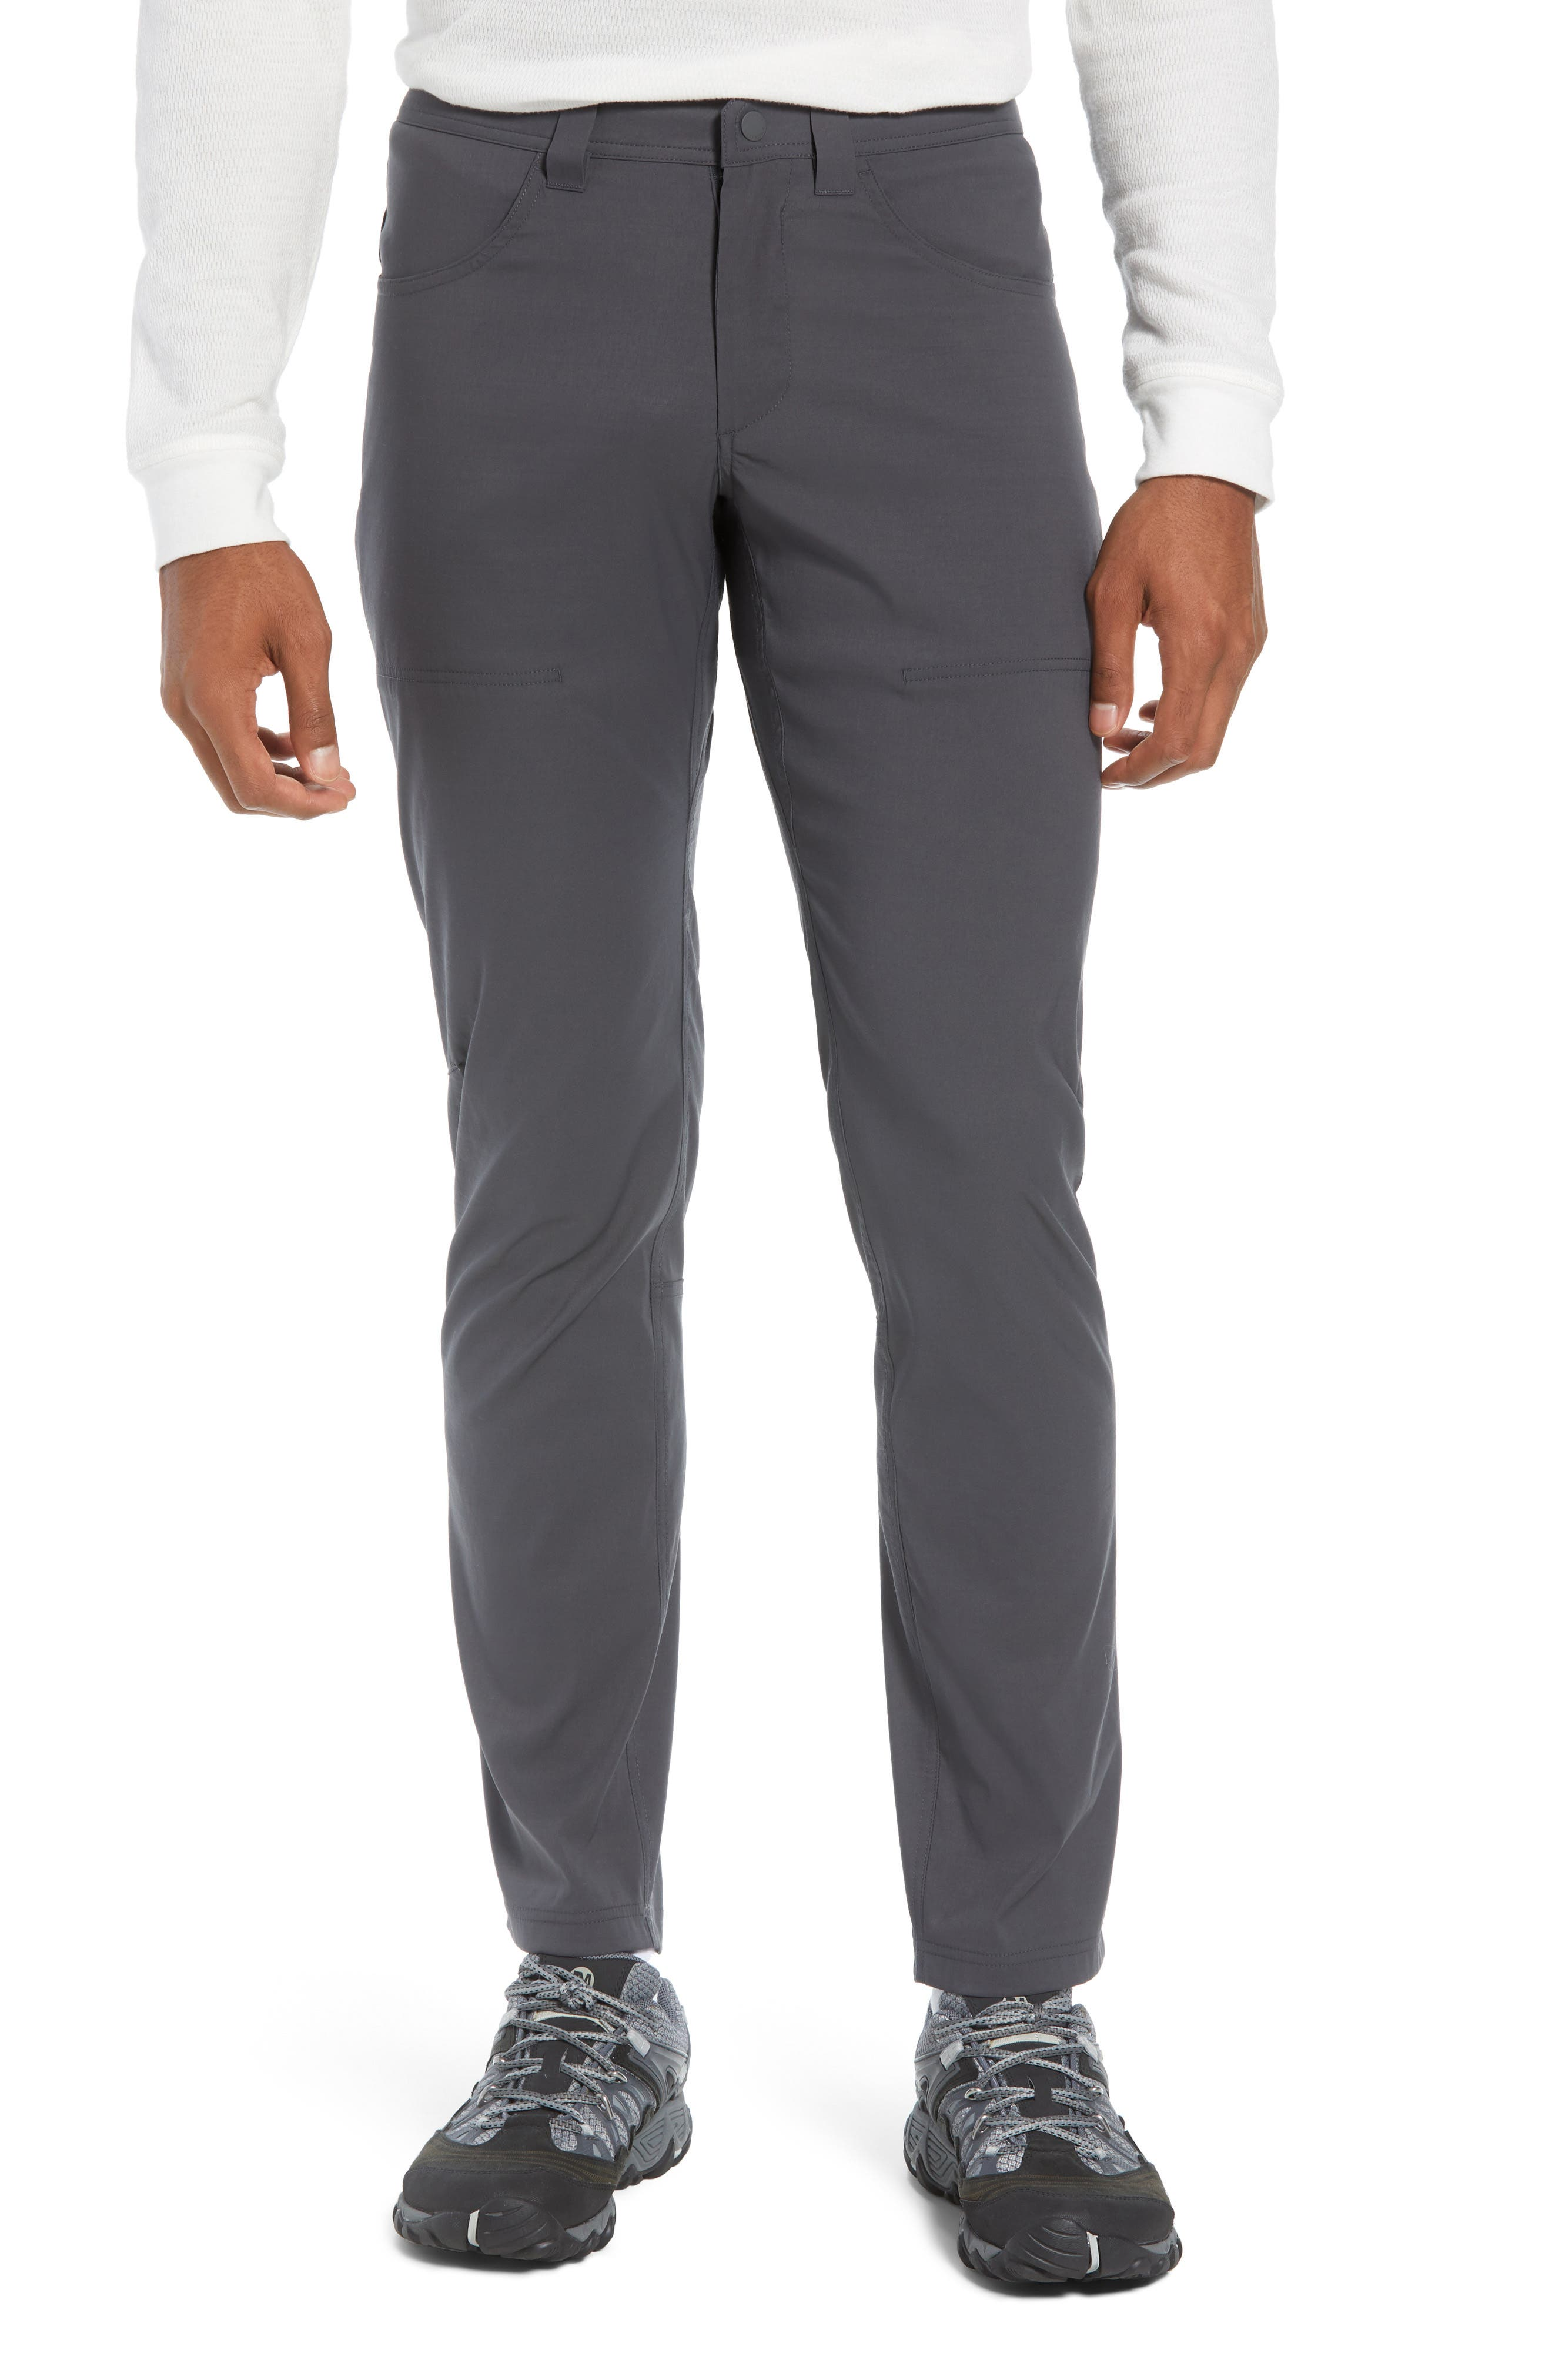 Icebreaker Persist Straight Pants, Grey